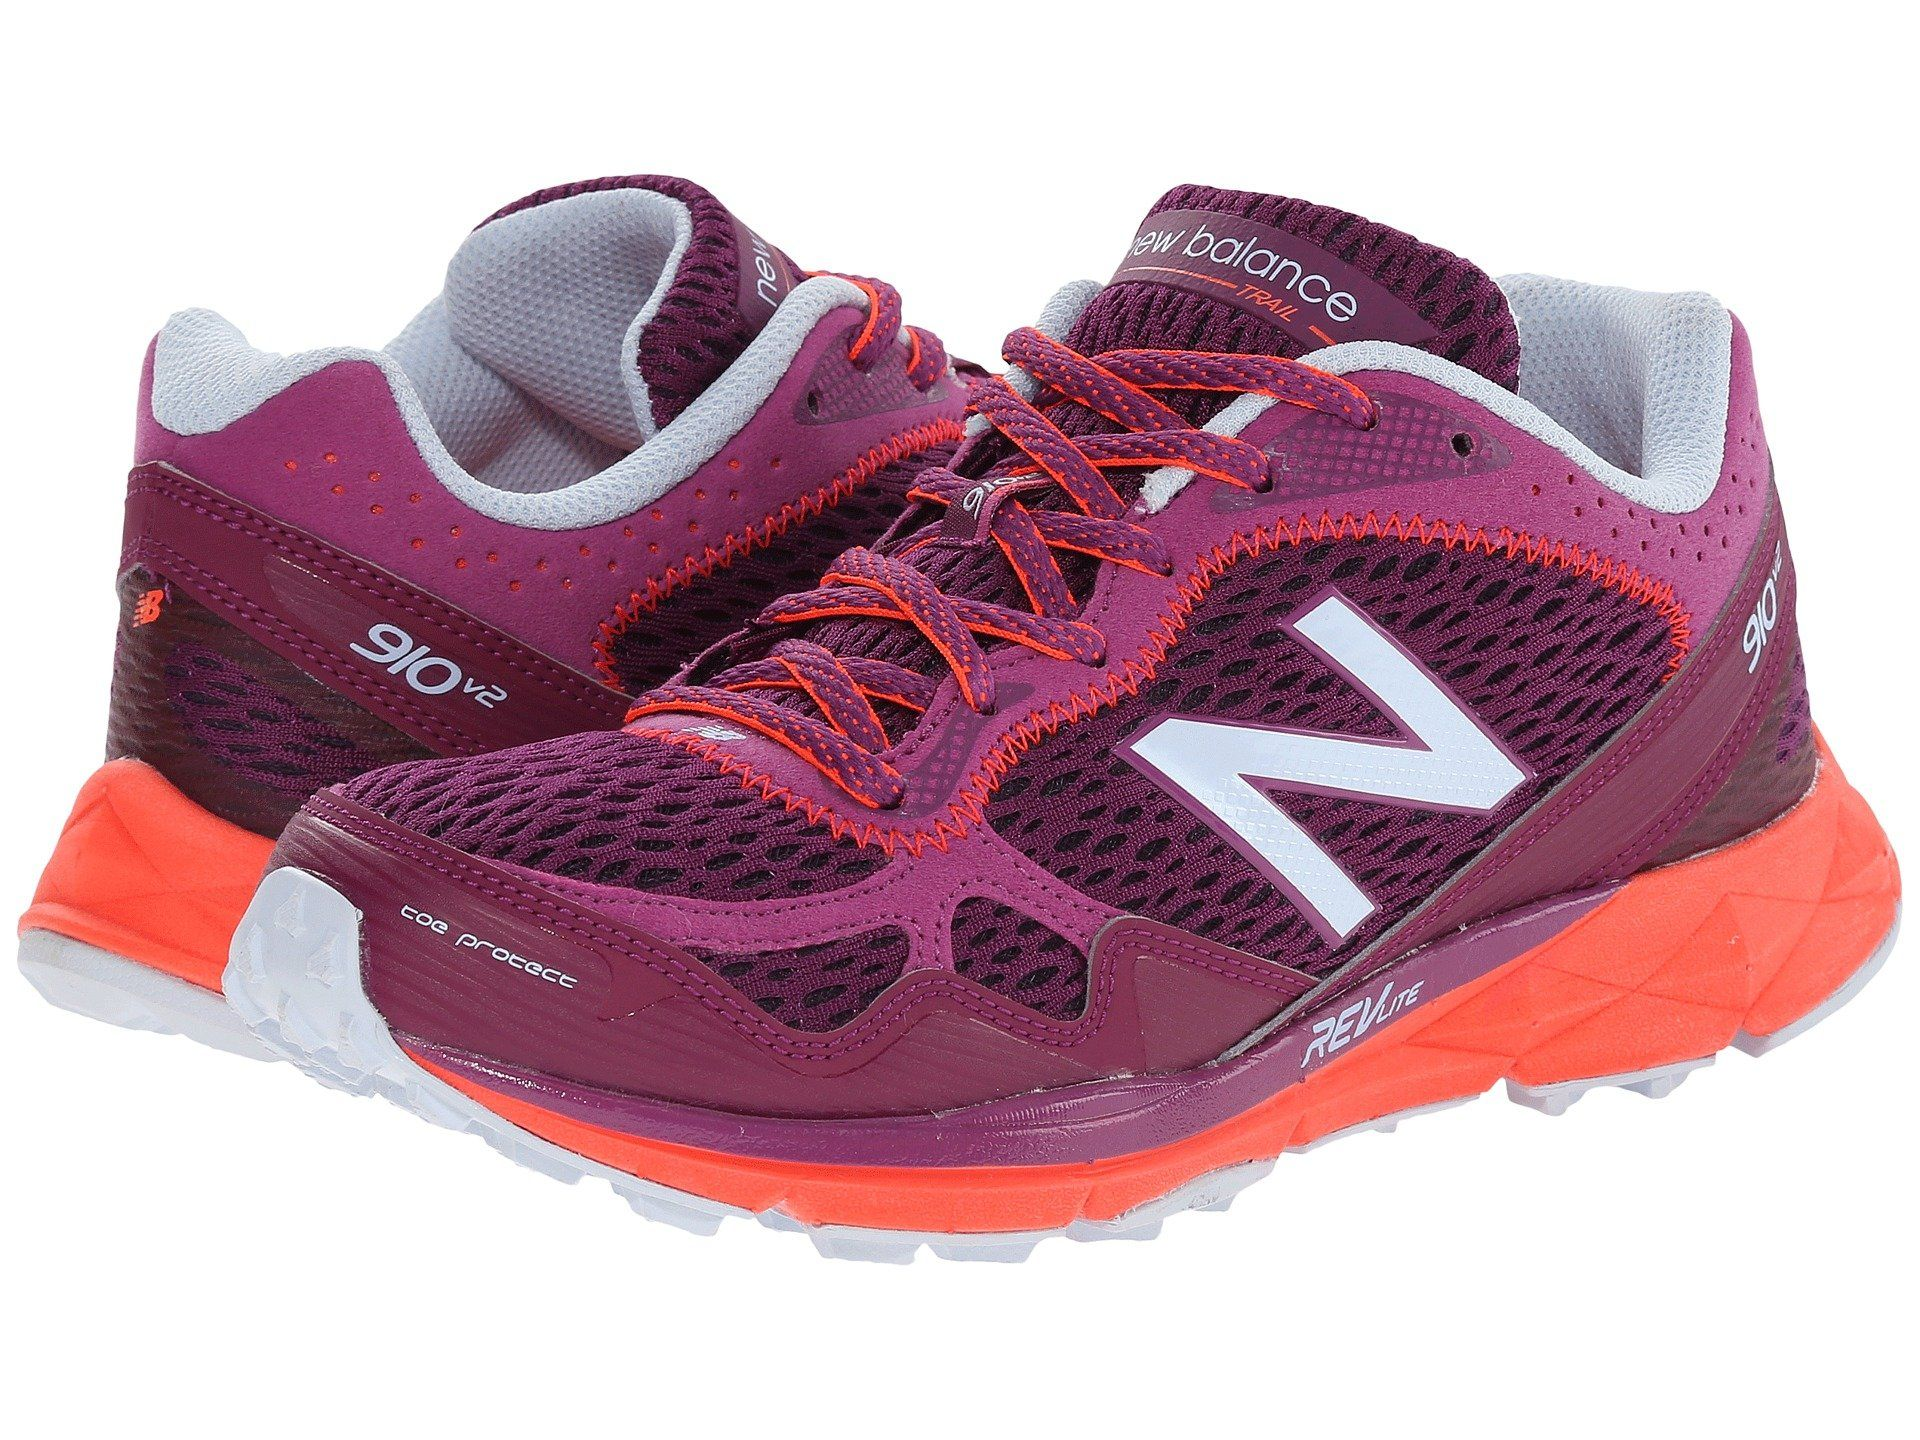 Womens Shoes New Balance WT910v2 Purple/Orange